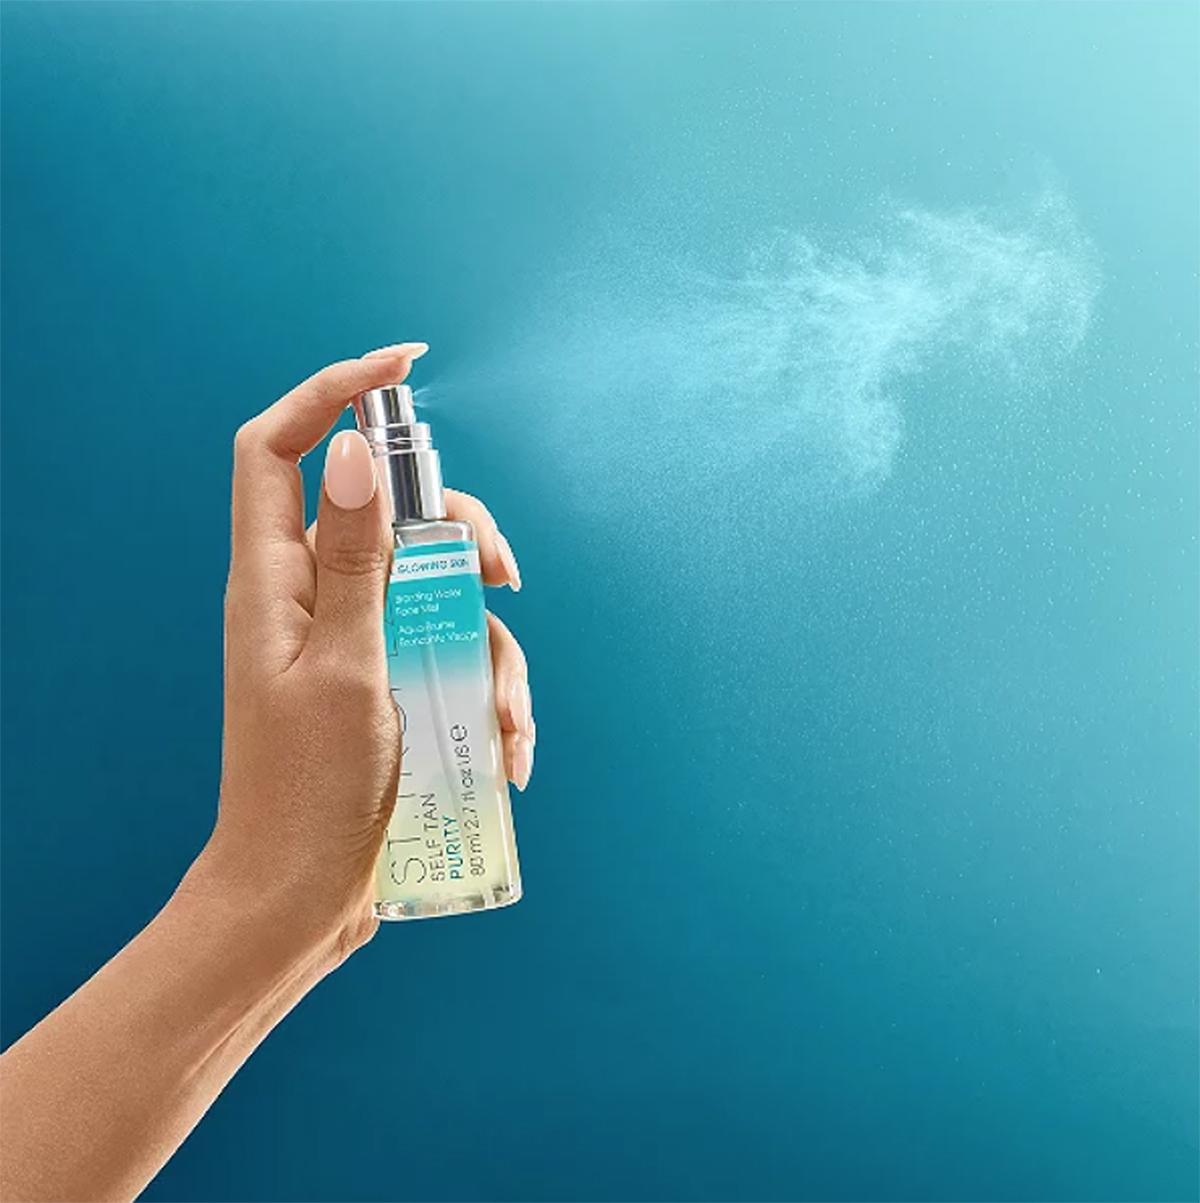 St. Tropez Self Tan Purity Bronzing Water Face Mist